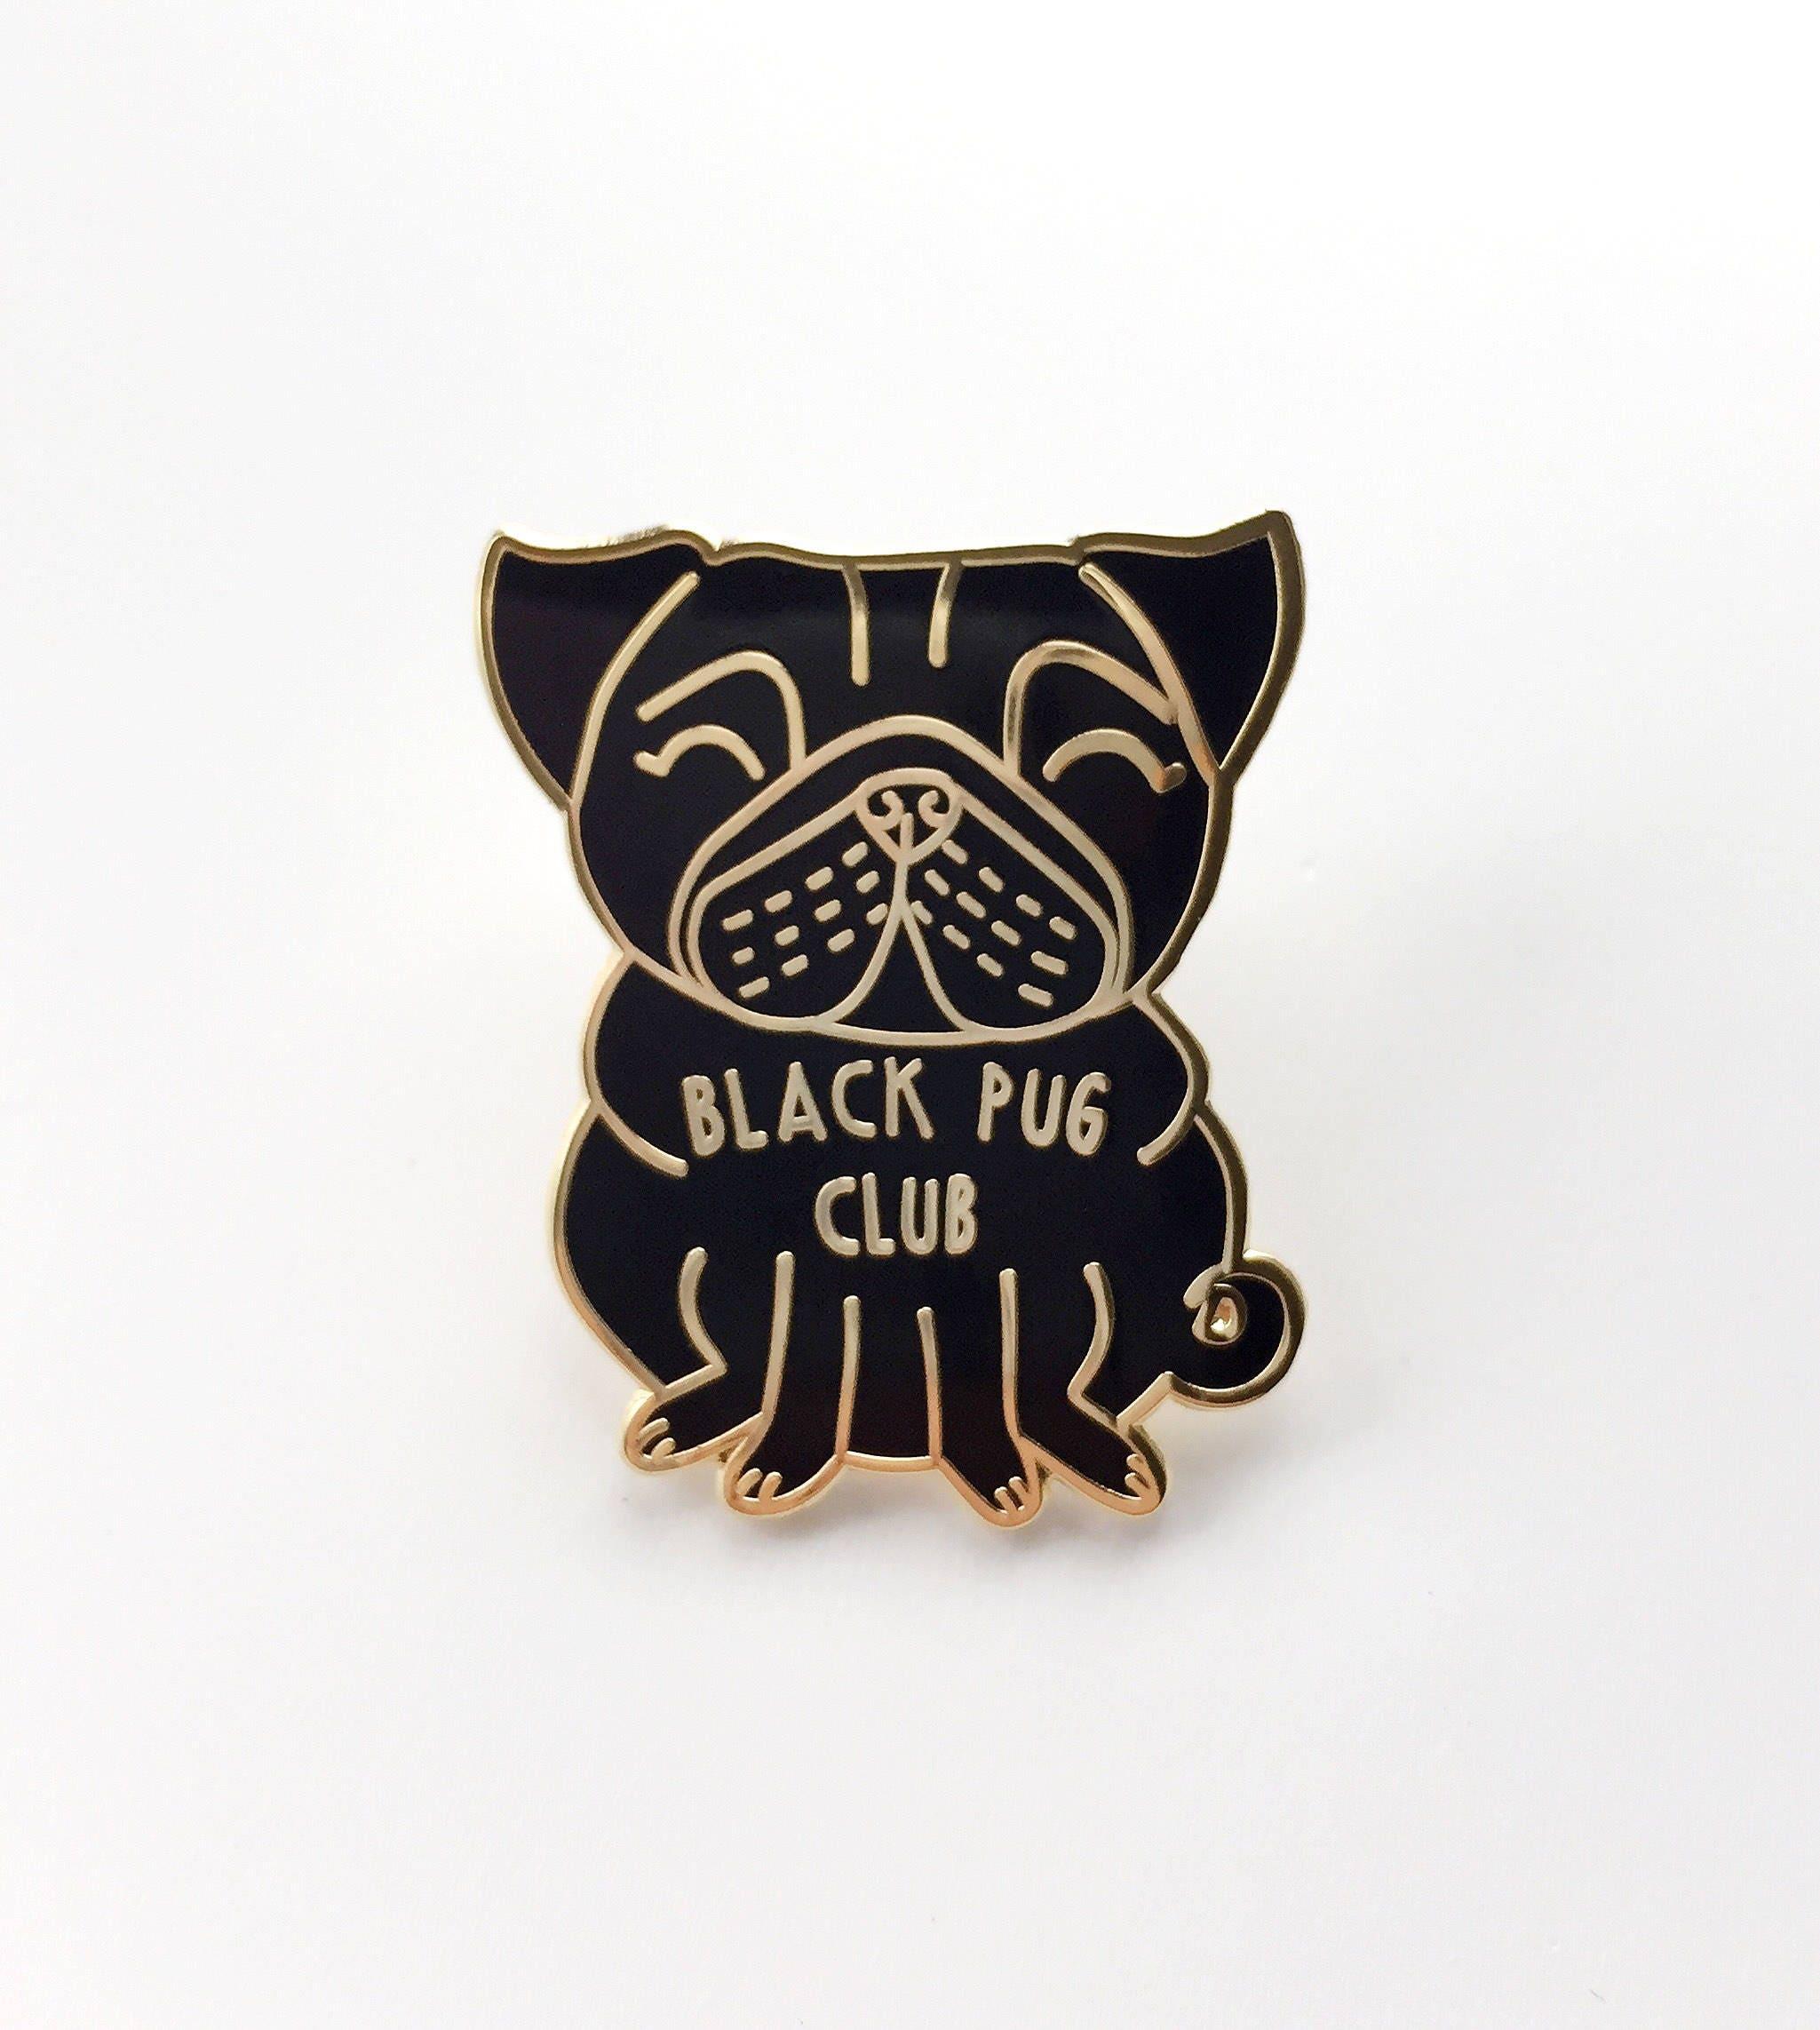 Black Pug Pin Pug Gifts Pug Brooch Pug Badge Enamel Lapel Pin Pug Jewellery Pug Jewelry Cute Pug  Black Pug Club